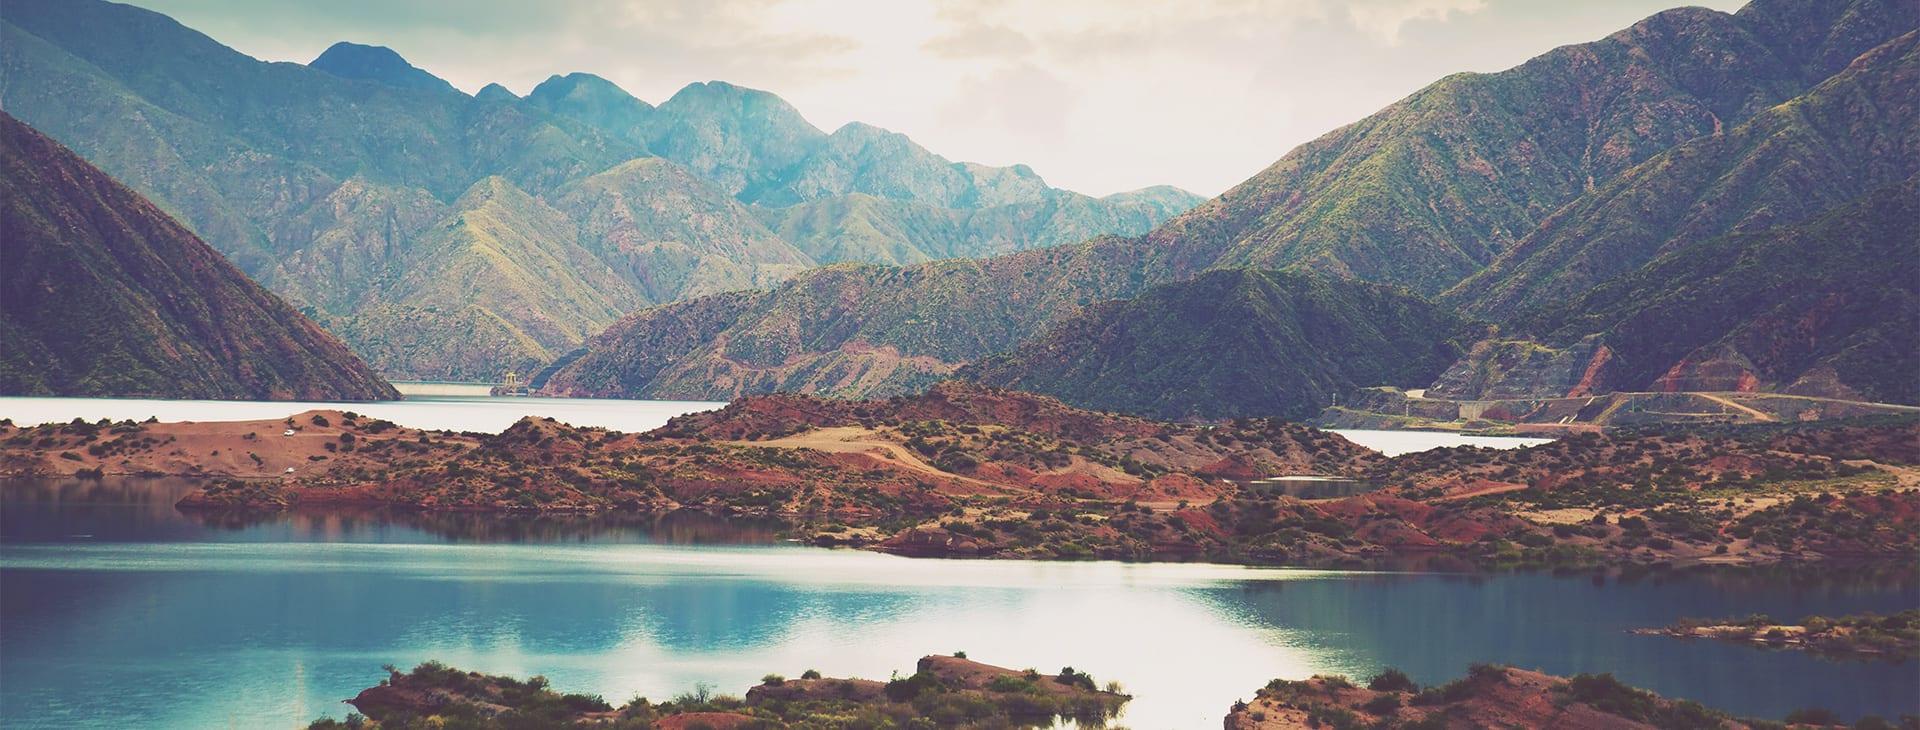 Lake and Mountain View Mendoza Argentina